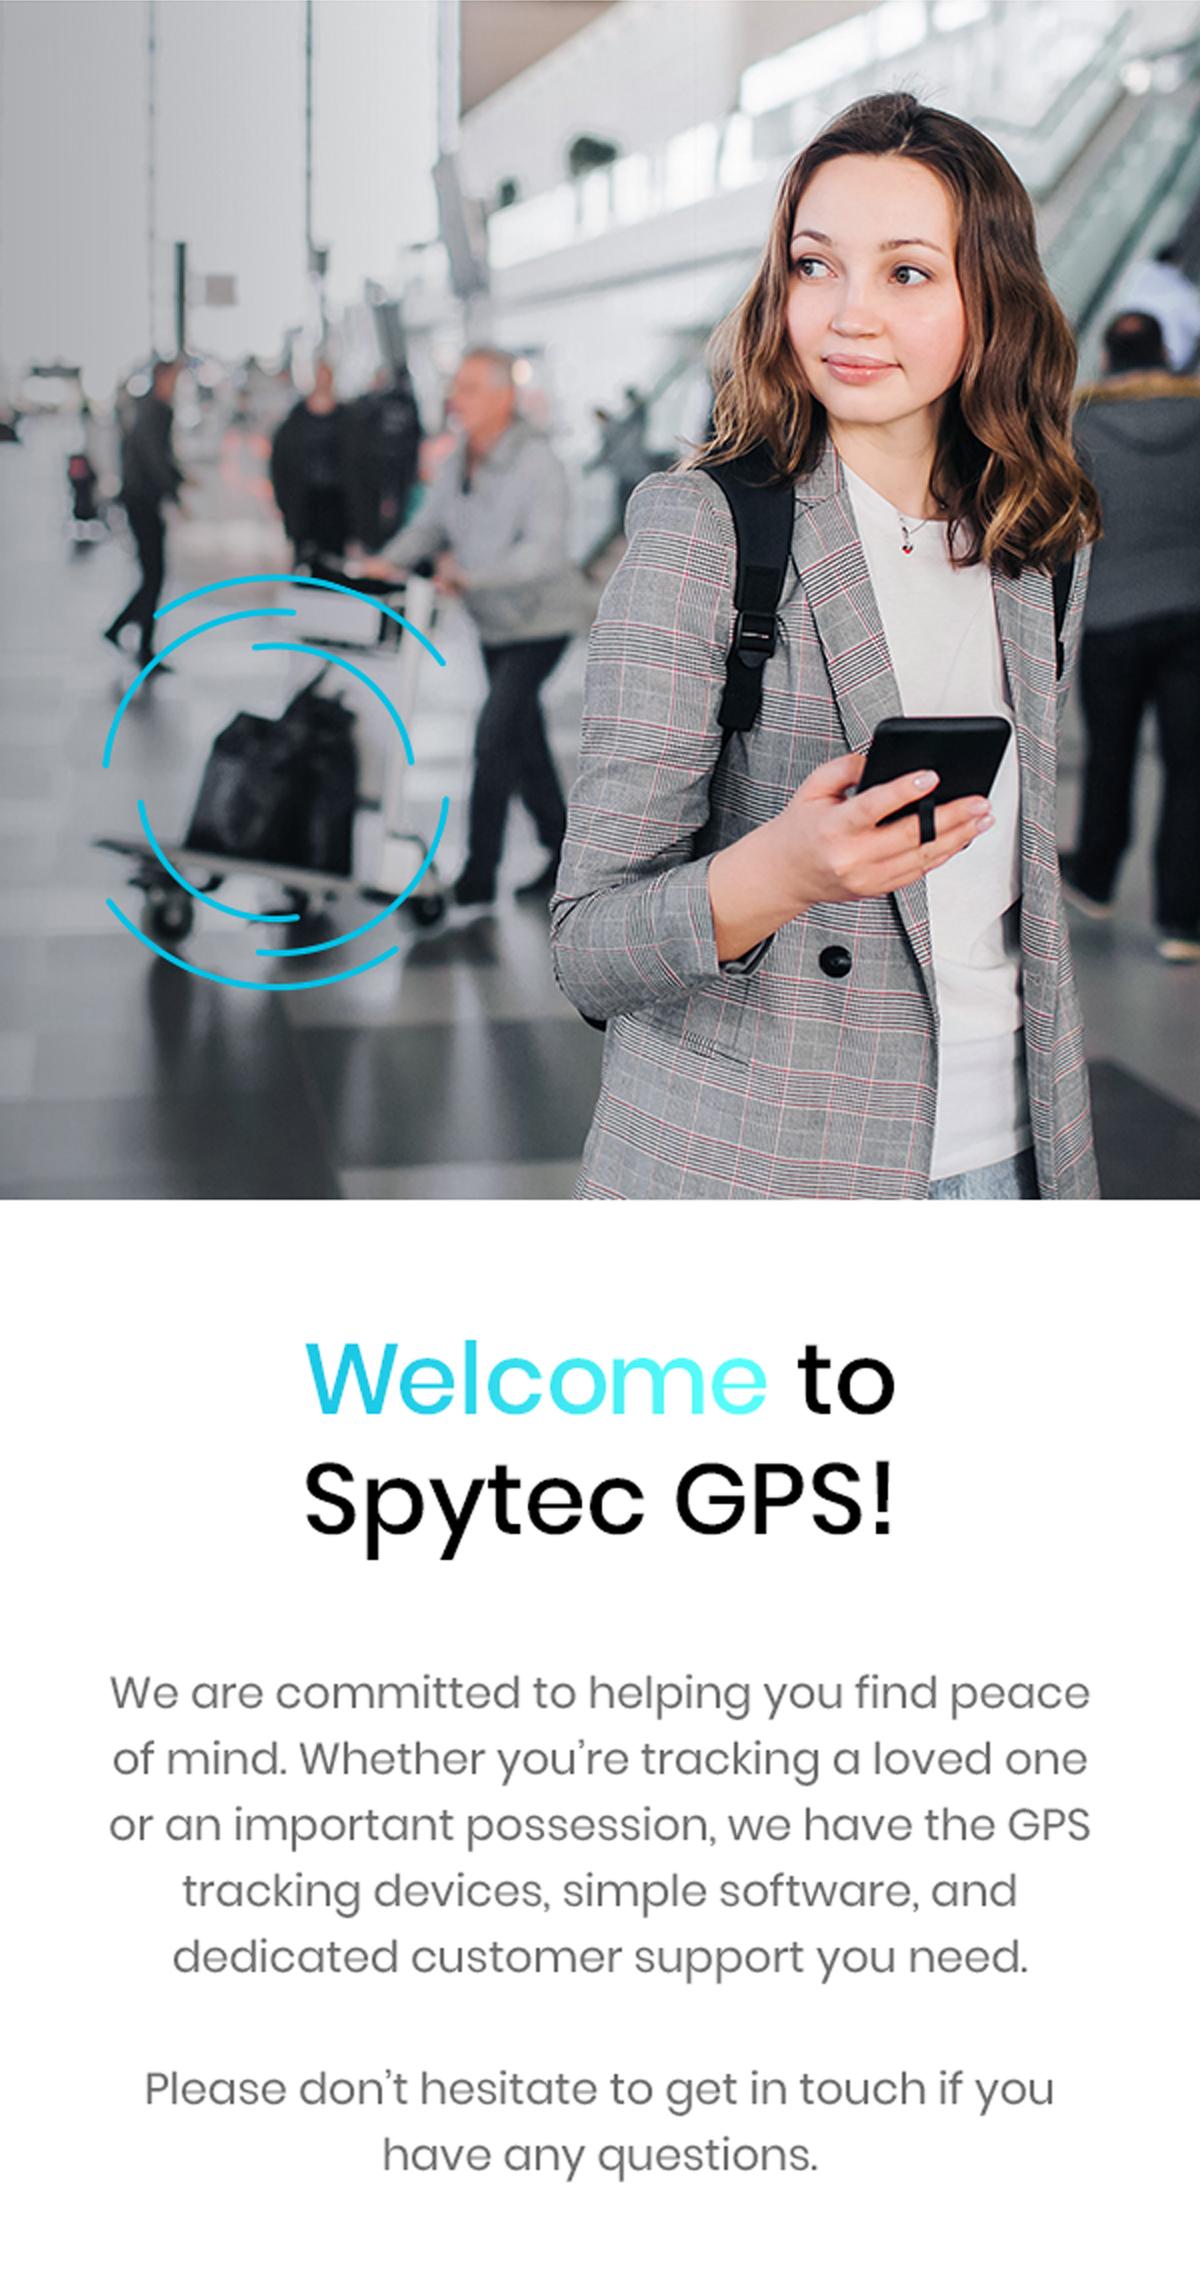 Spytec_WelcomeSeries_WelcomeEmail_v2.1_02-1